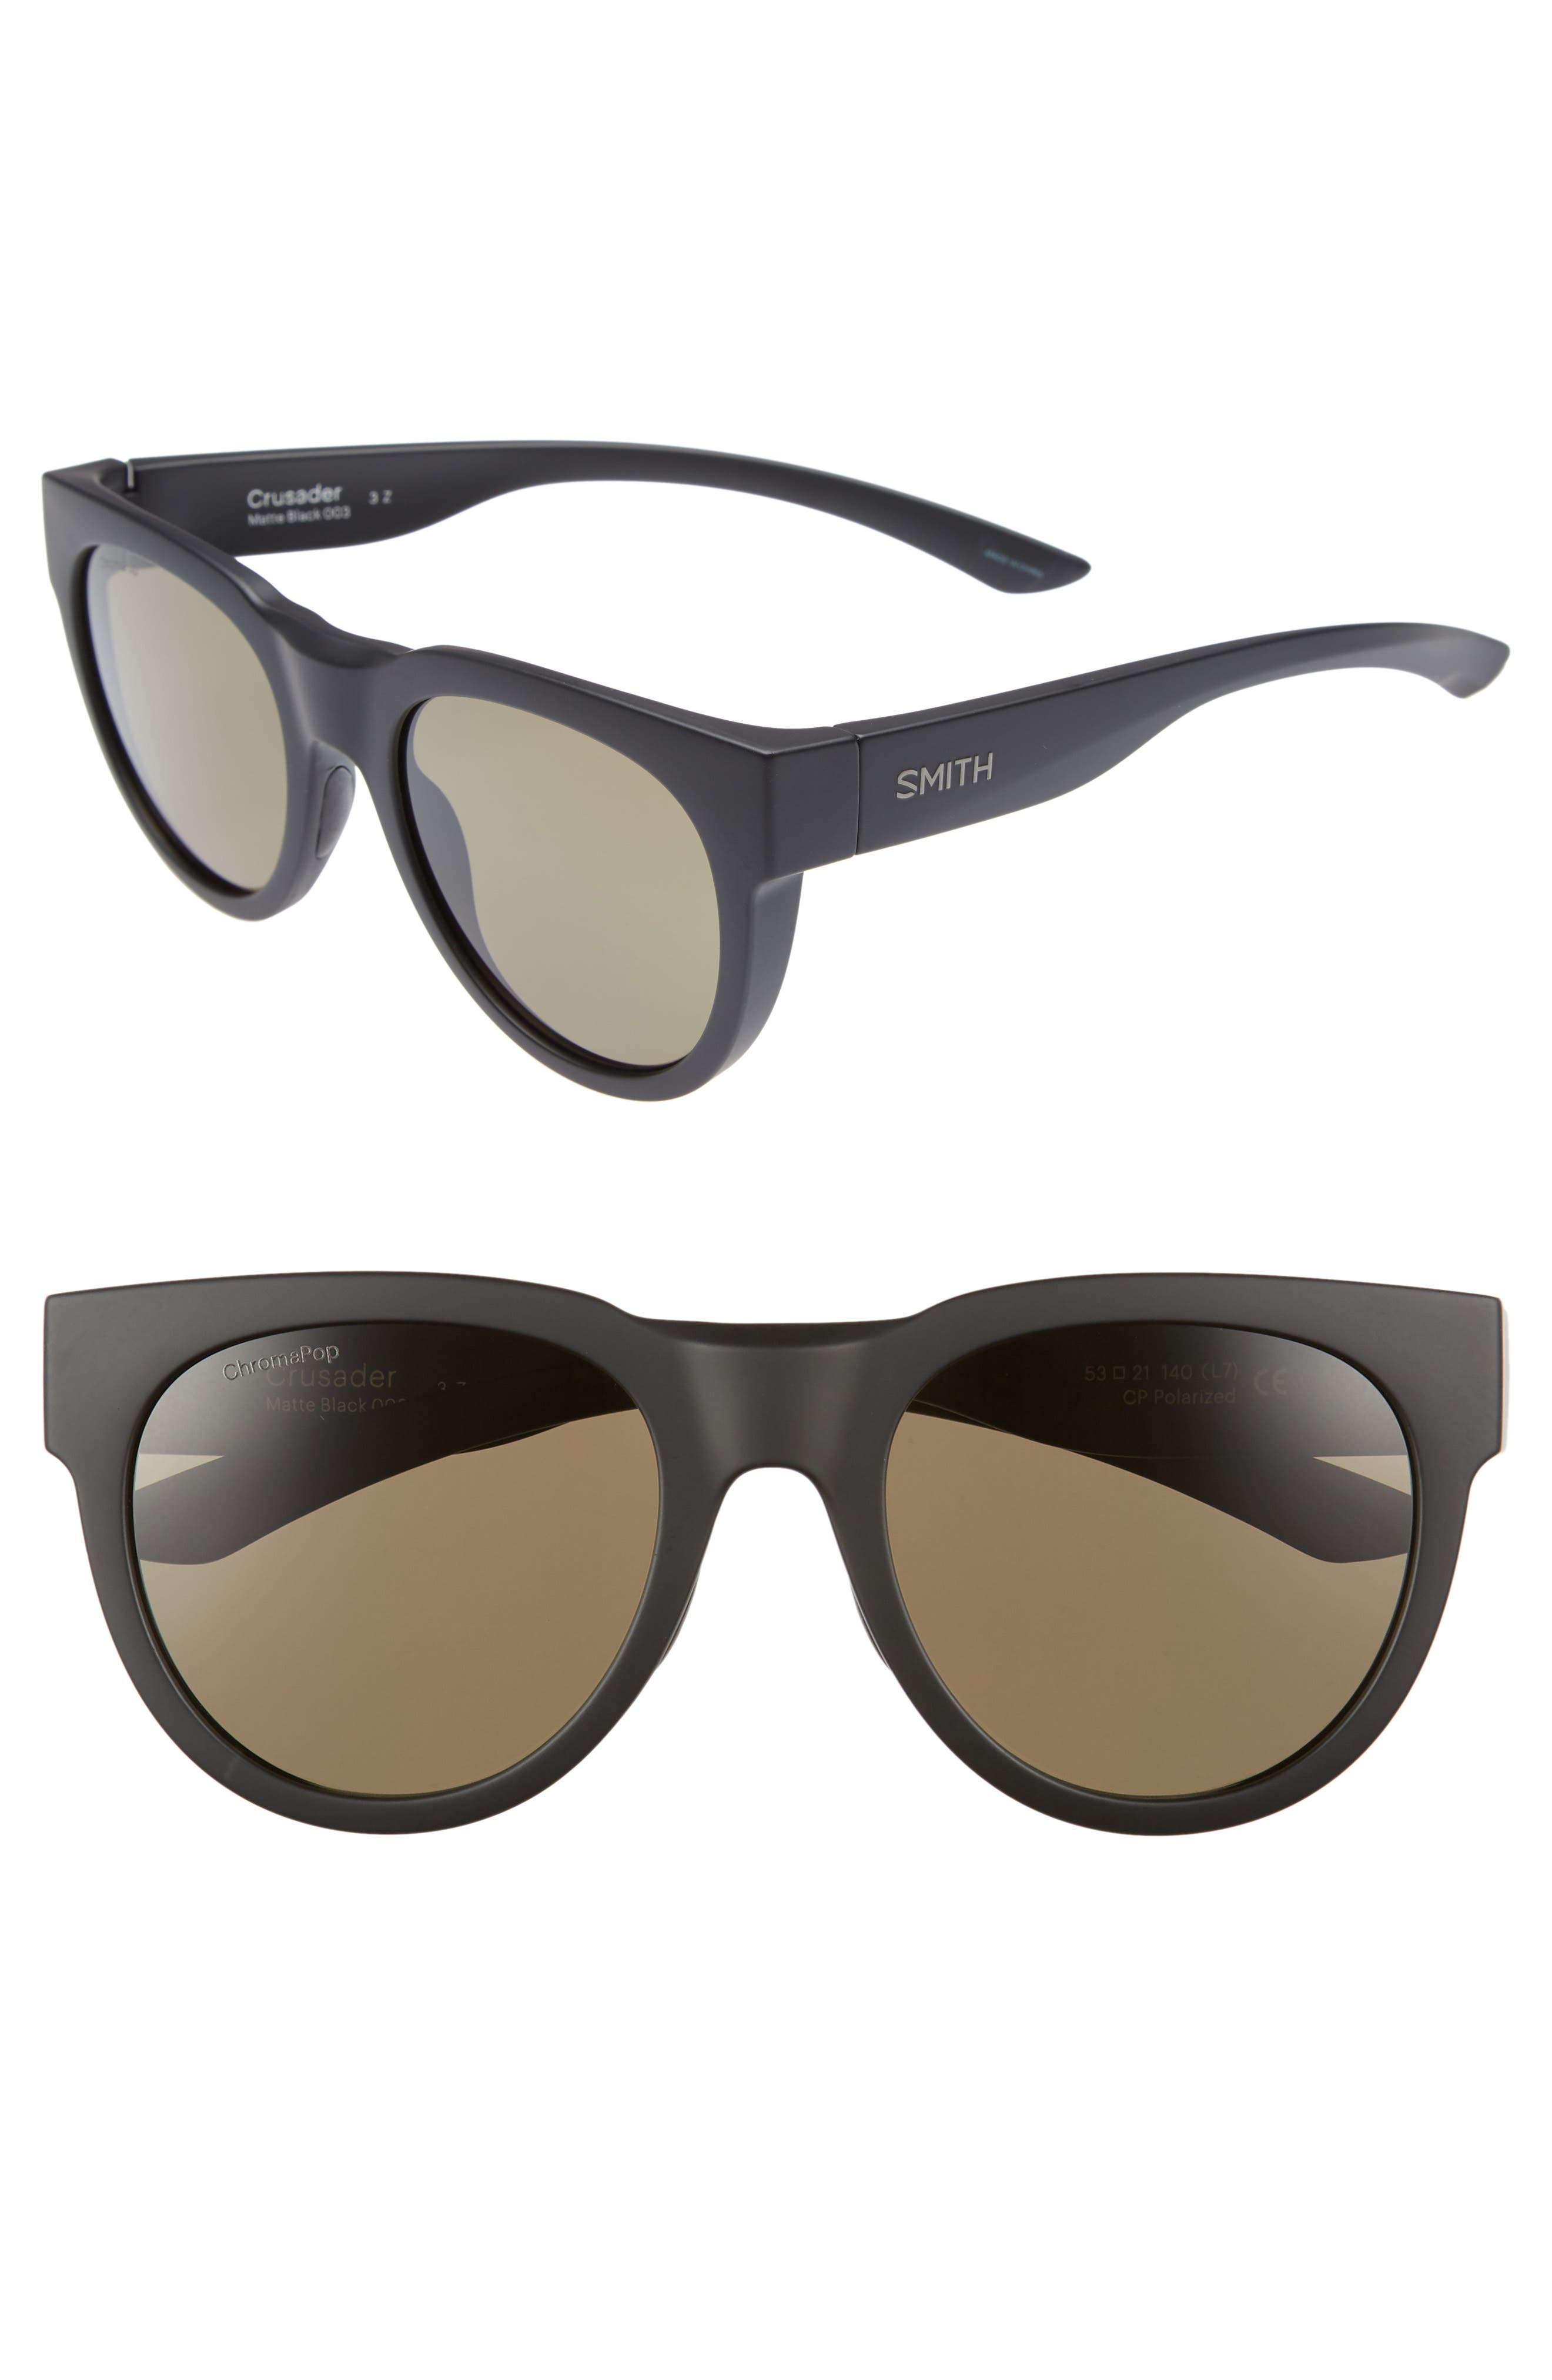 Smith Crusader 53mm ChromaPop™ Round Sunglasses